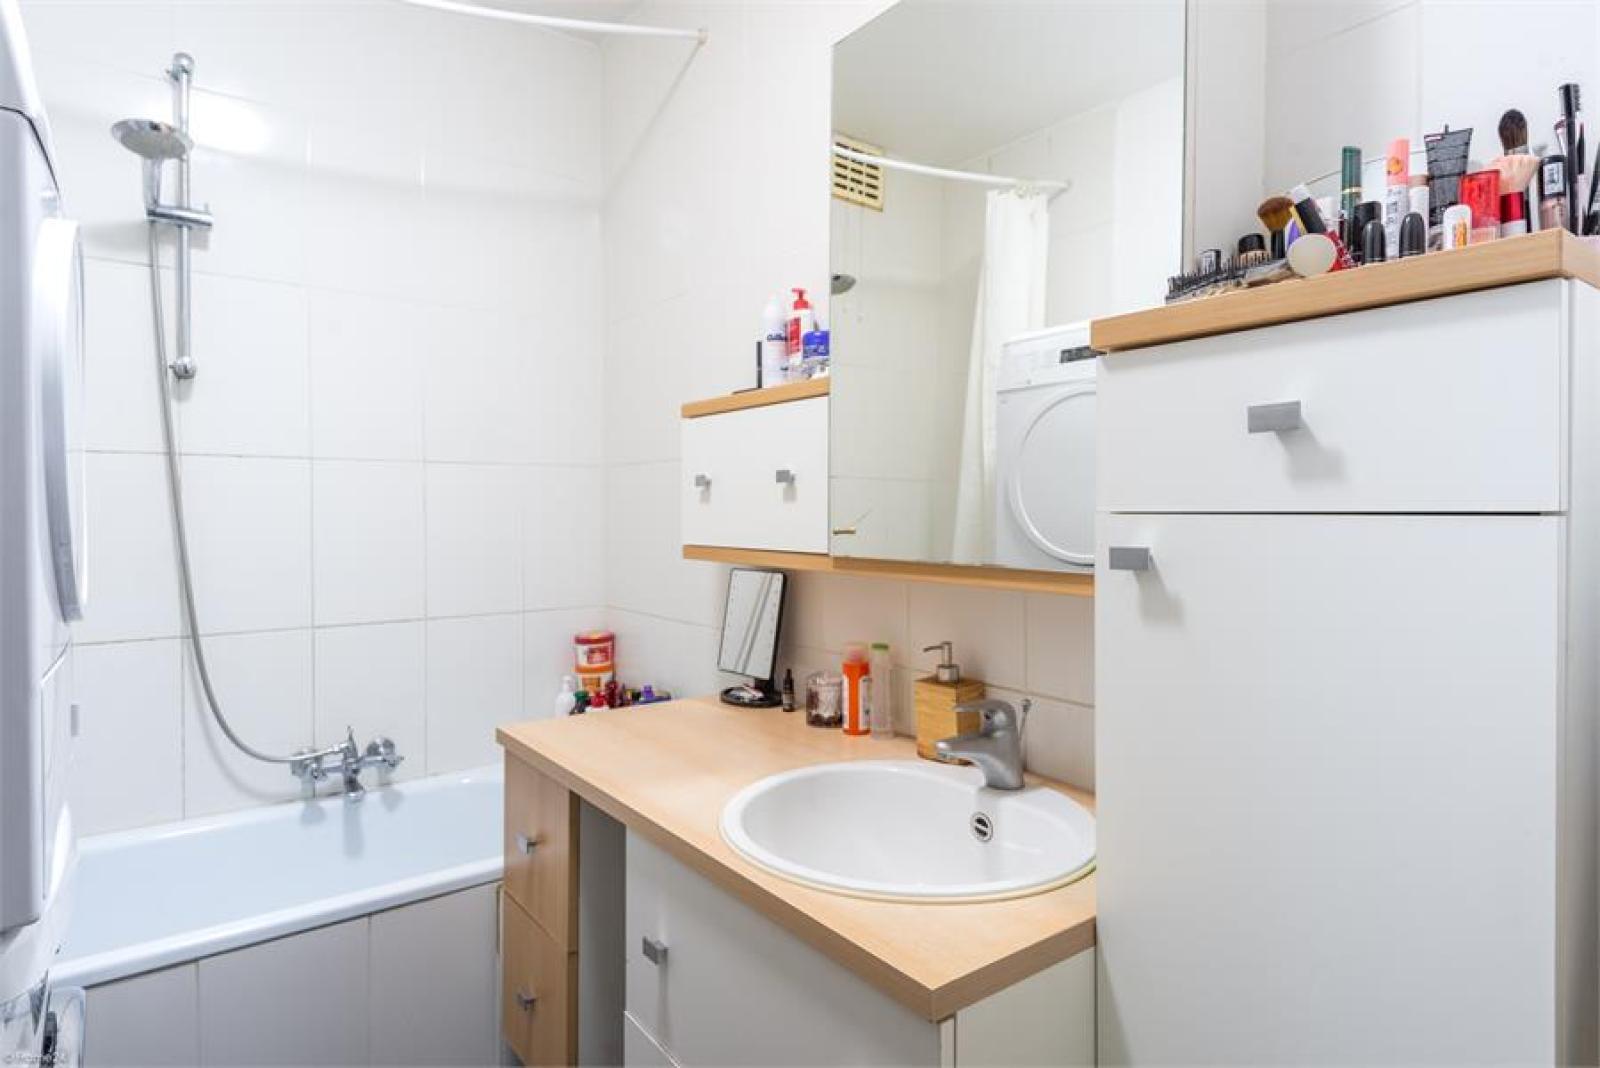 Instapklaar appartement (77 m²) met twee slaapkamers op centrale ligging te Deurne! afbeelding 12